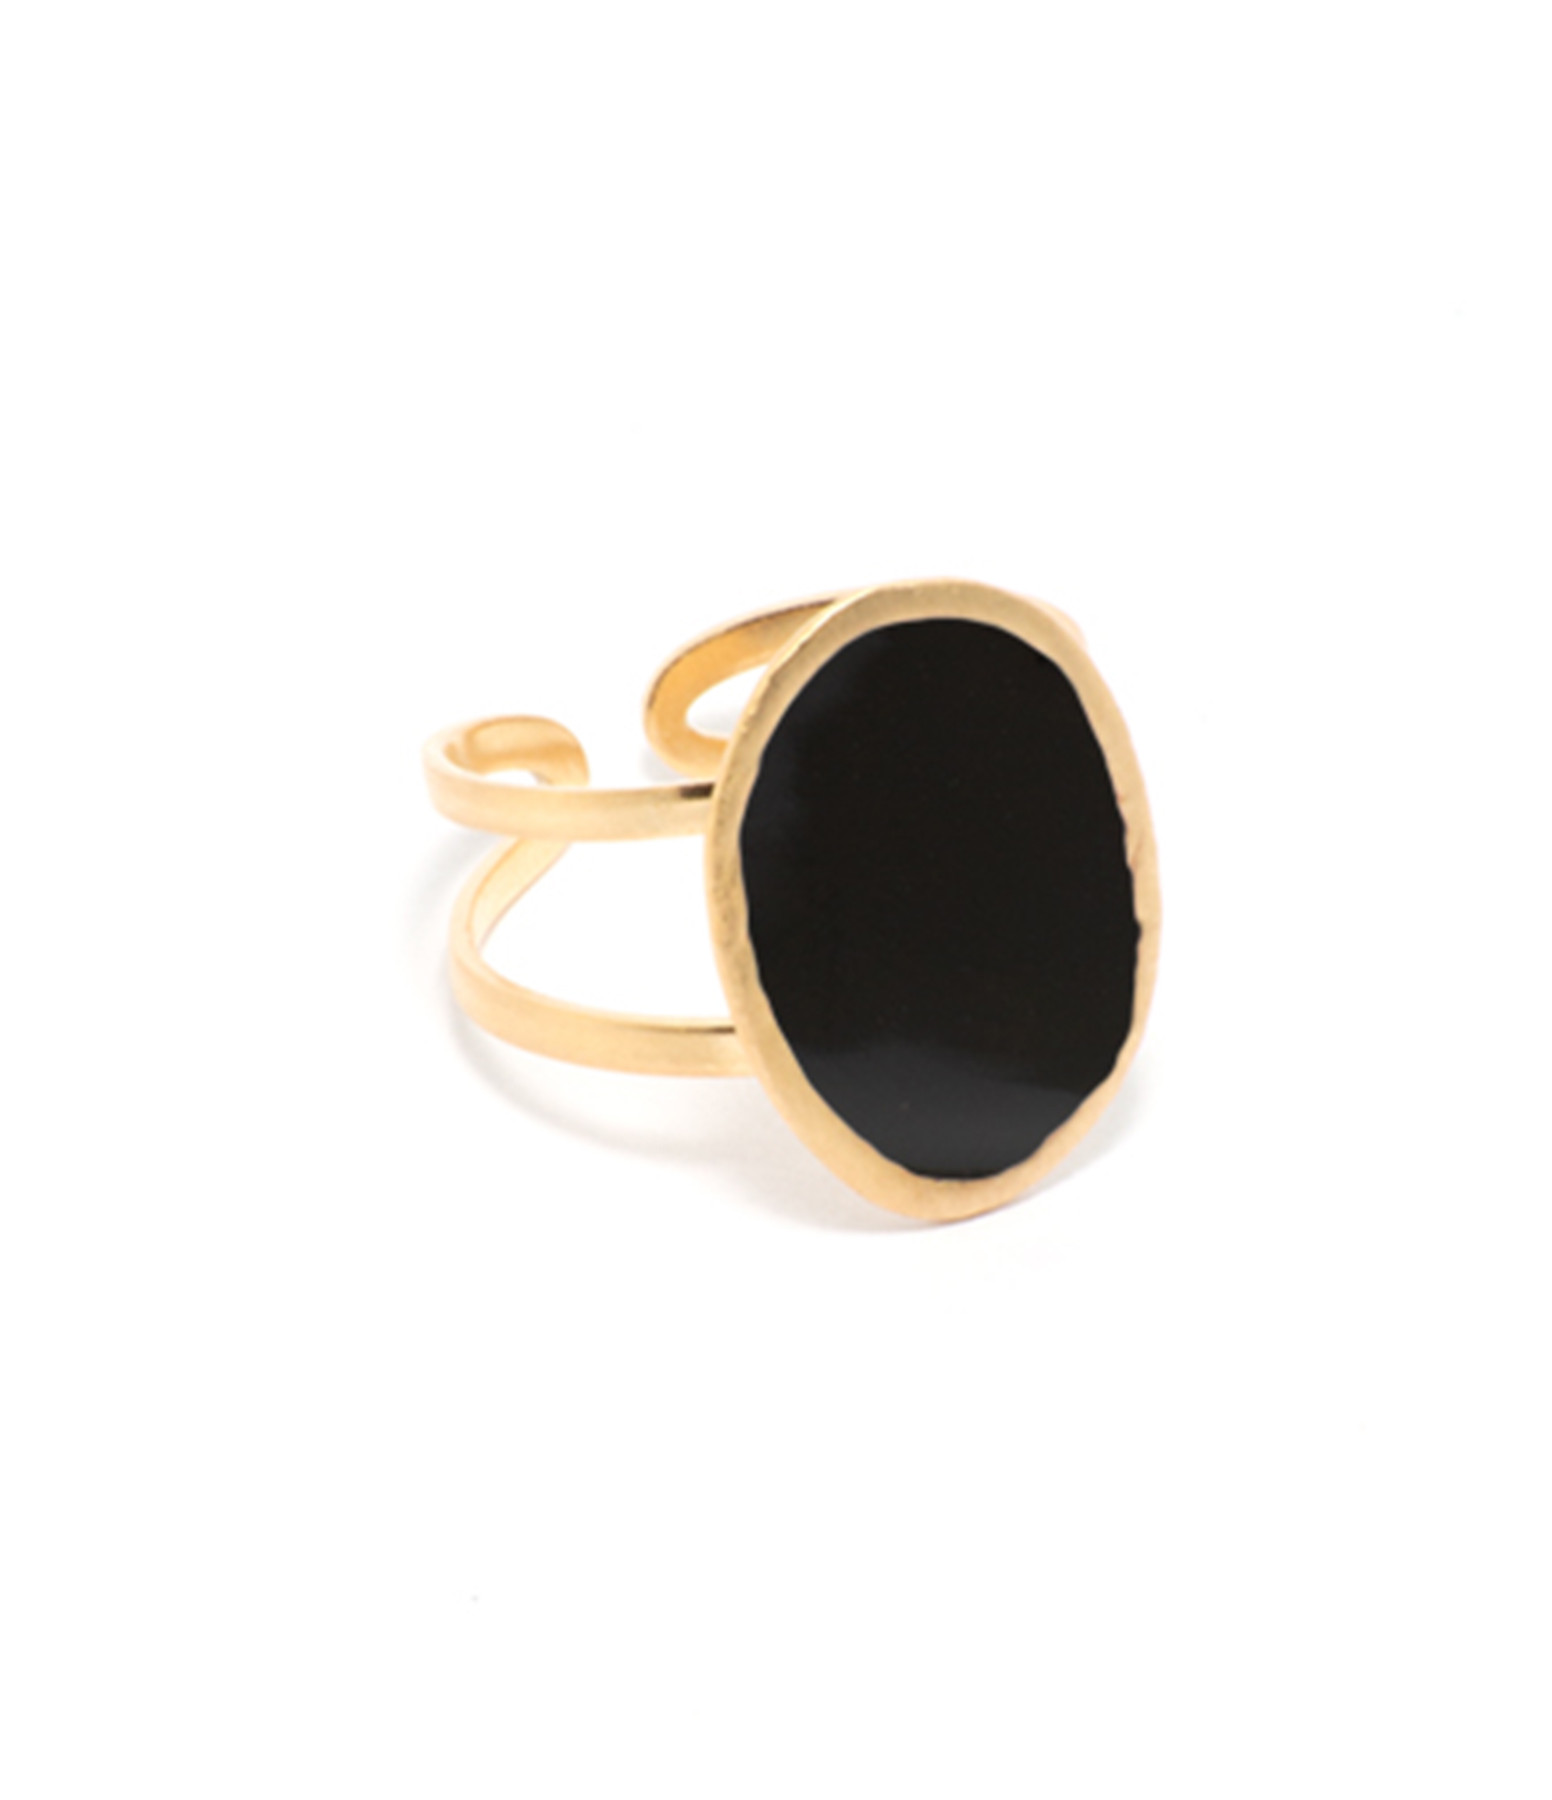 LSONGE - Bague Lumy Ovale Noir